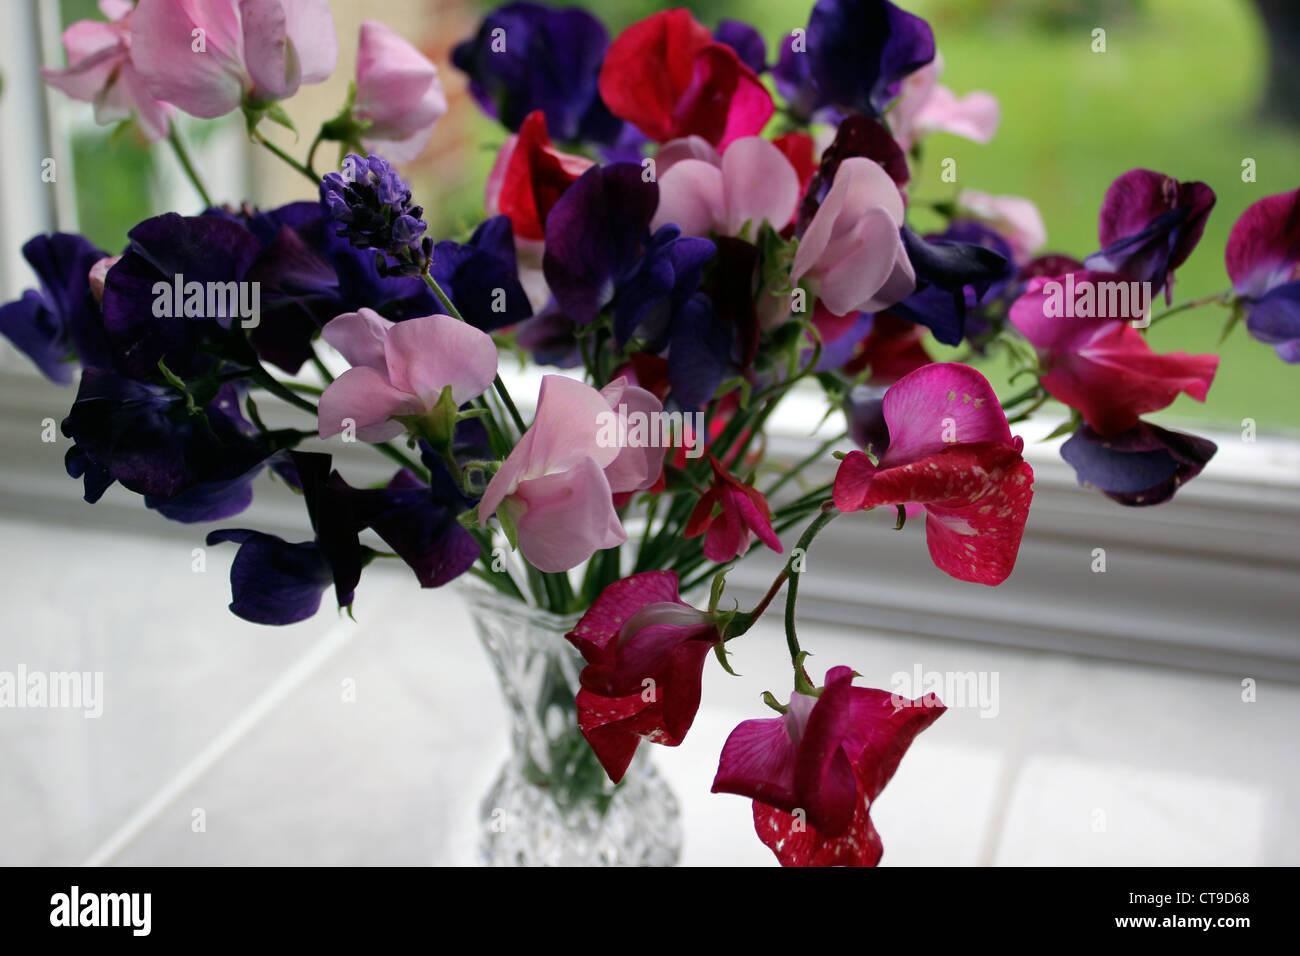 English sweet peasJuly - Stock Image